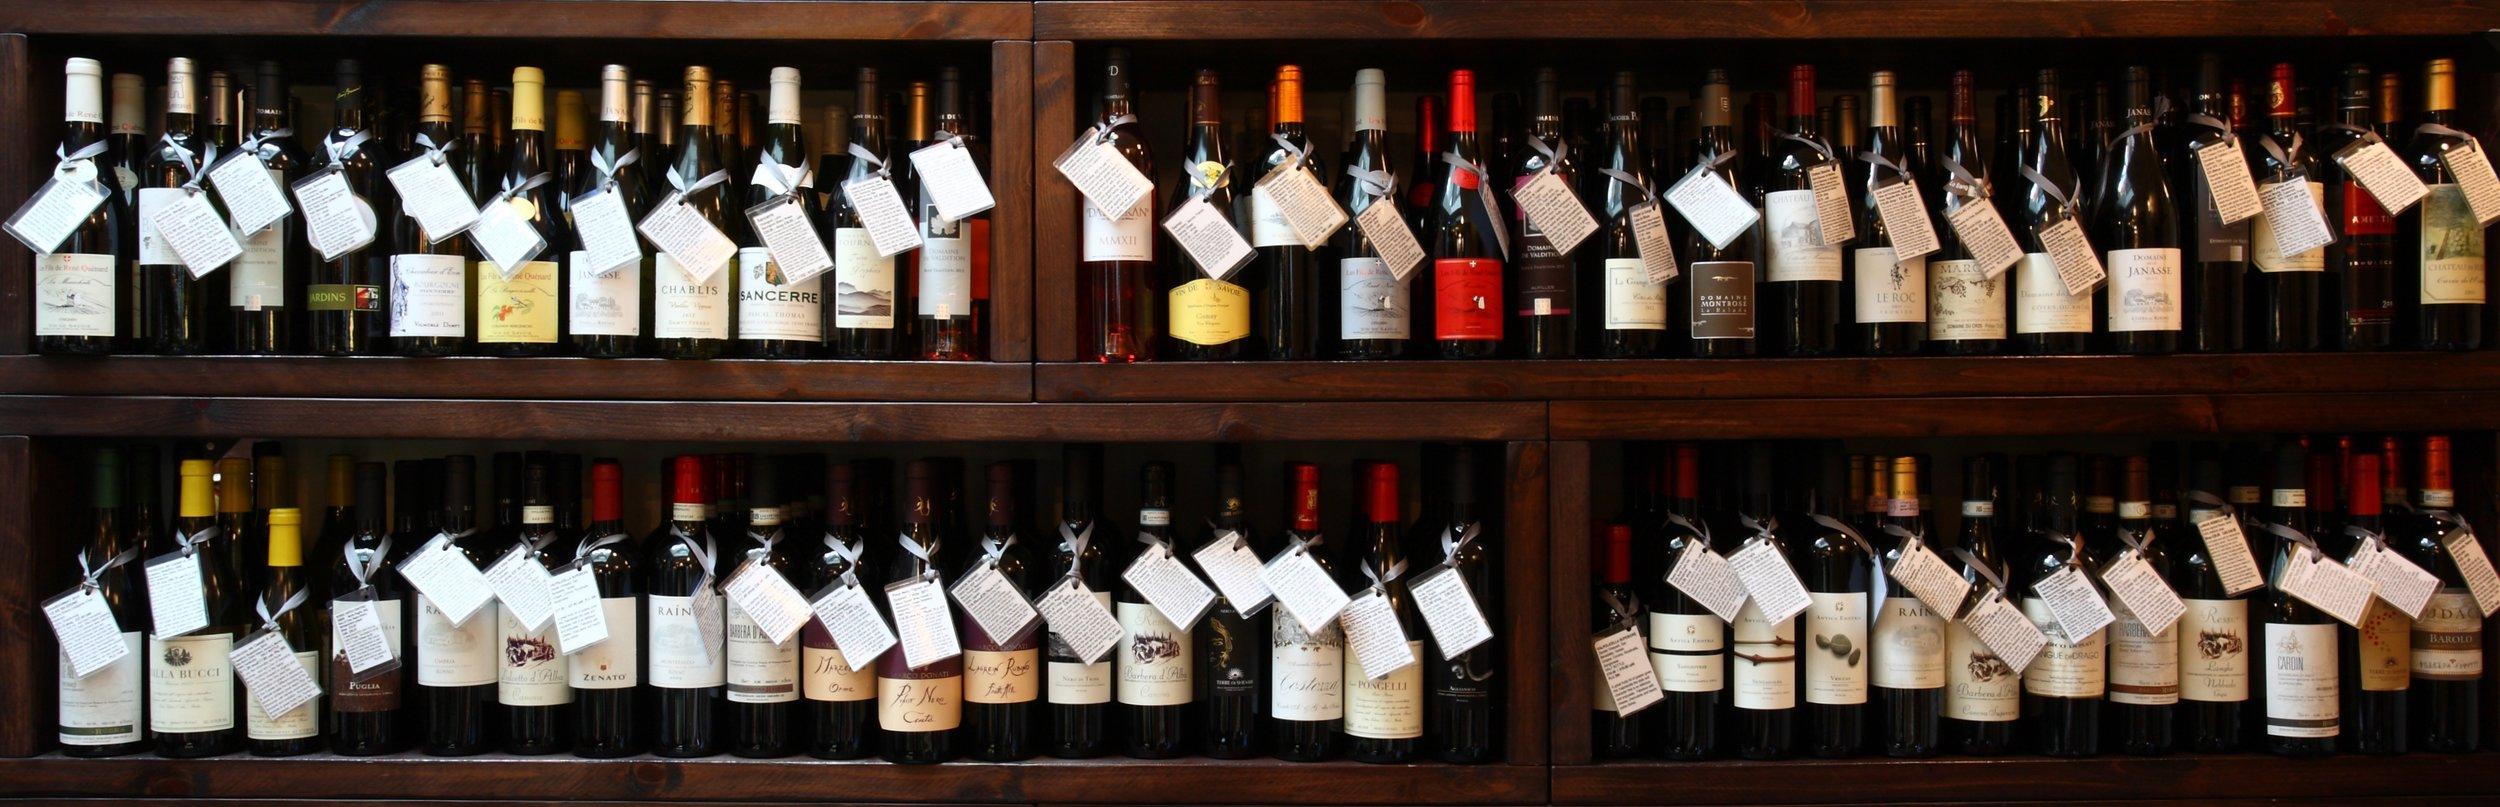 Wine Shelves Crop 2.jpg